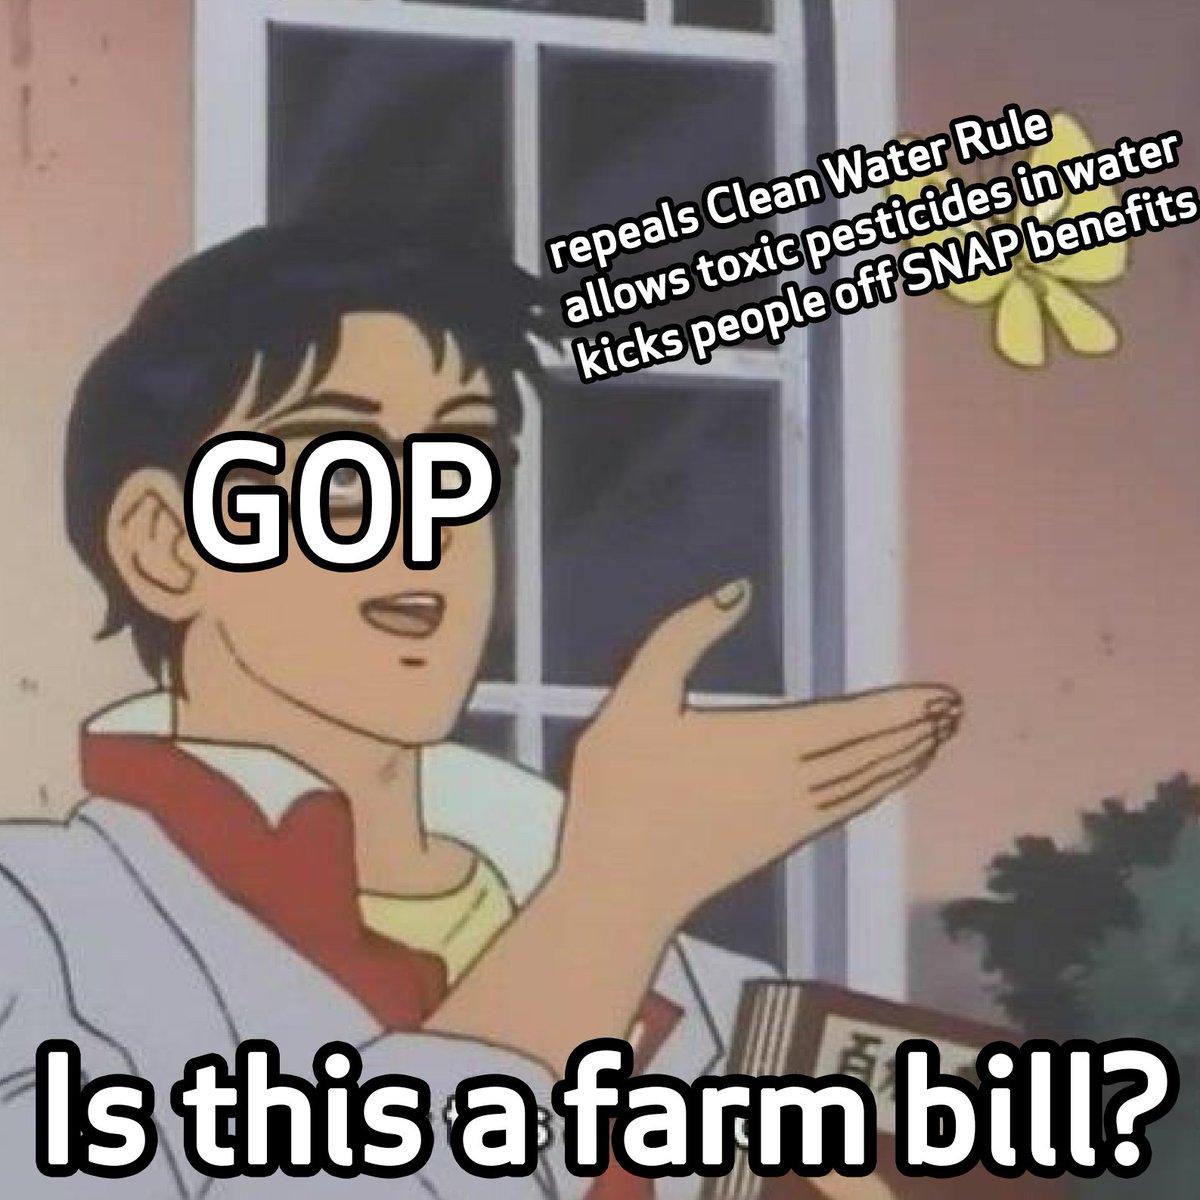 Is this a #FarmBill?  #GOPFarmBill #DirtyWaterRider <br>http://pic.twitter.com/1cNzY0HQlU